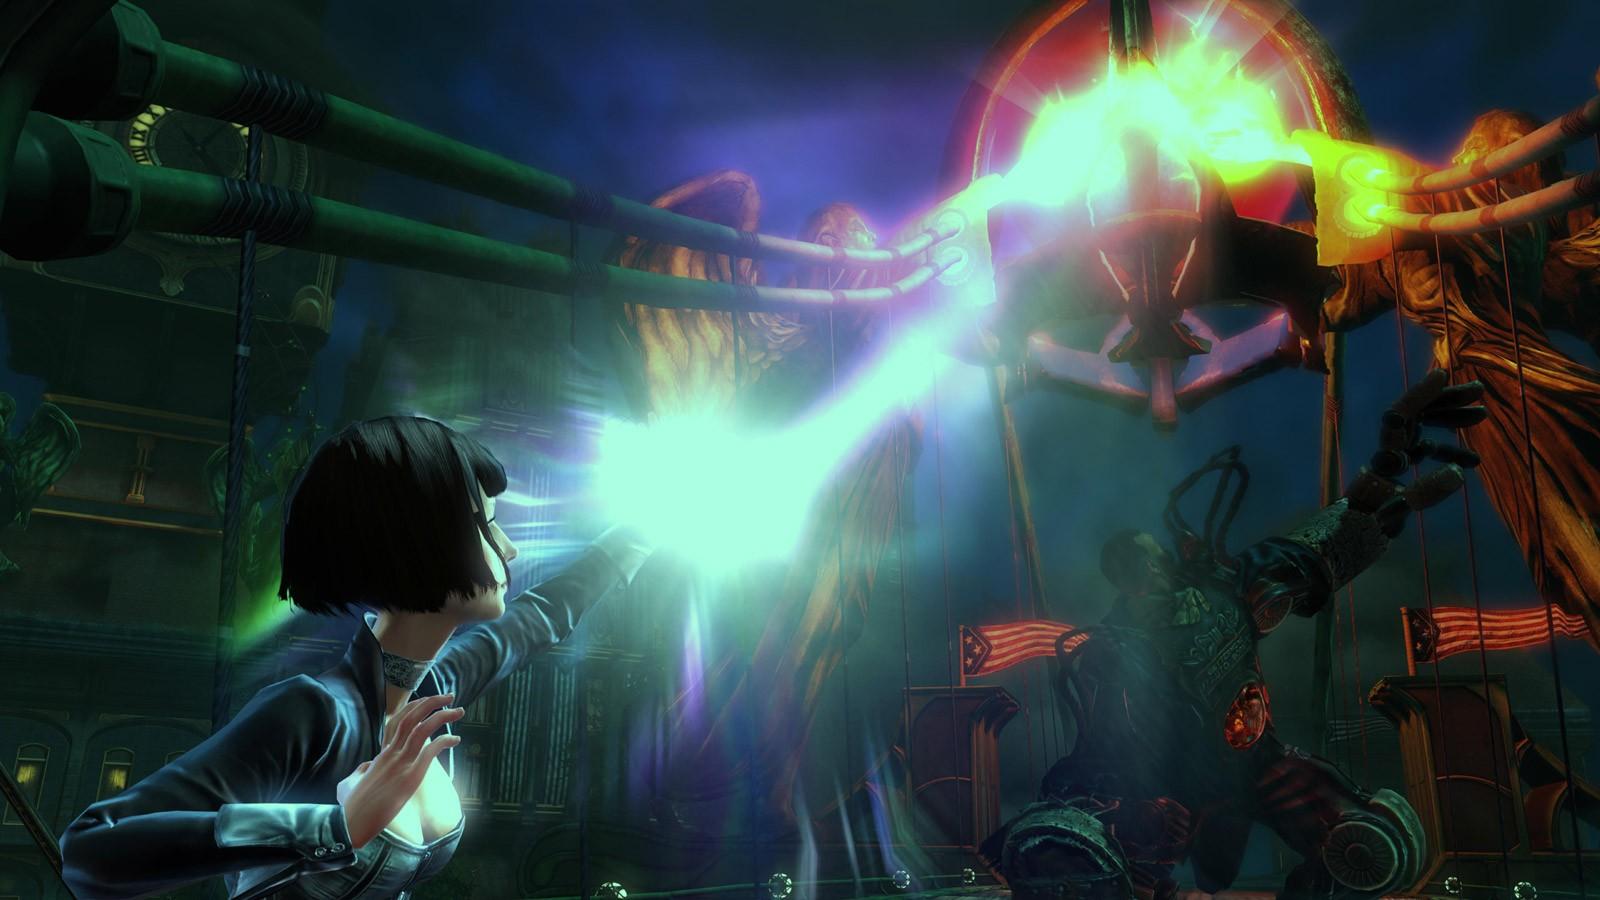 Bioshock Infinite - In game